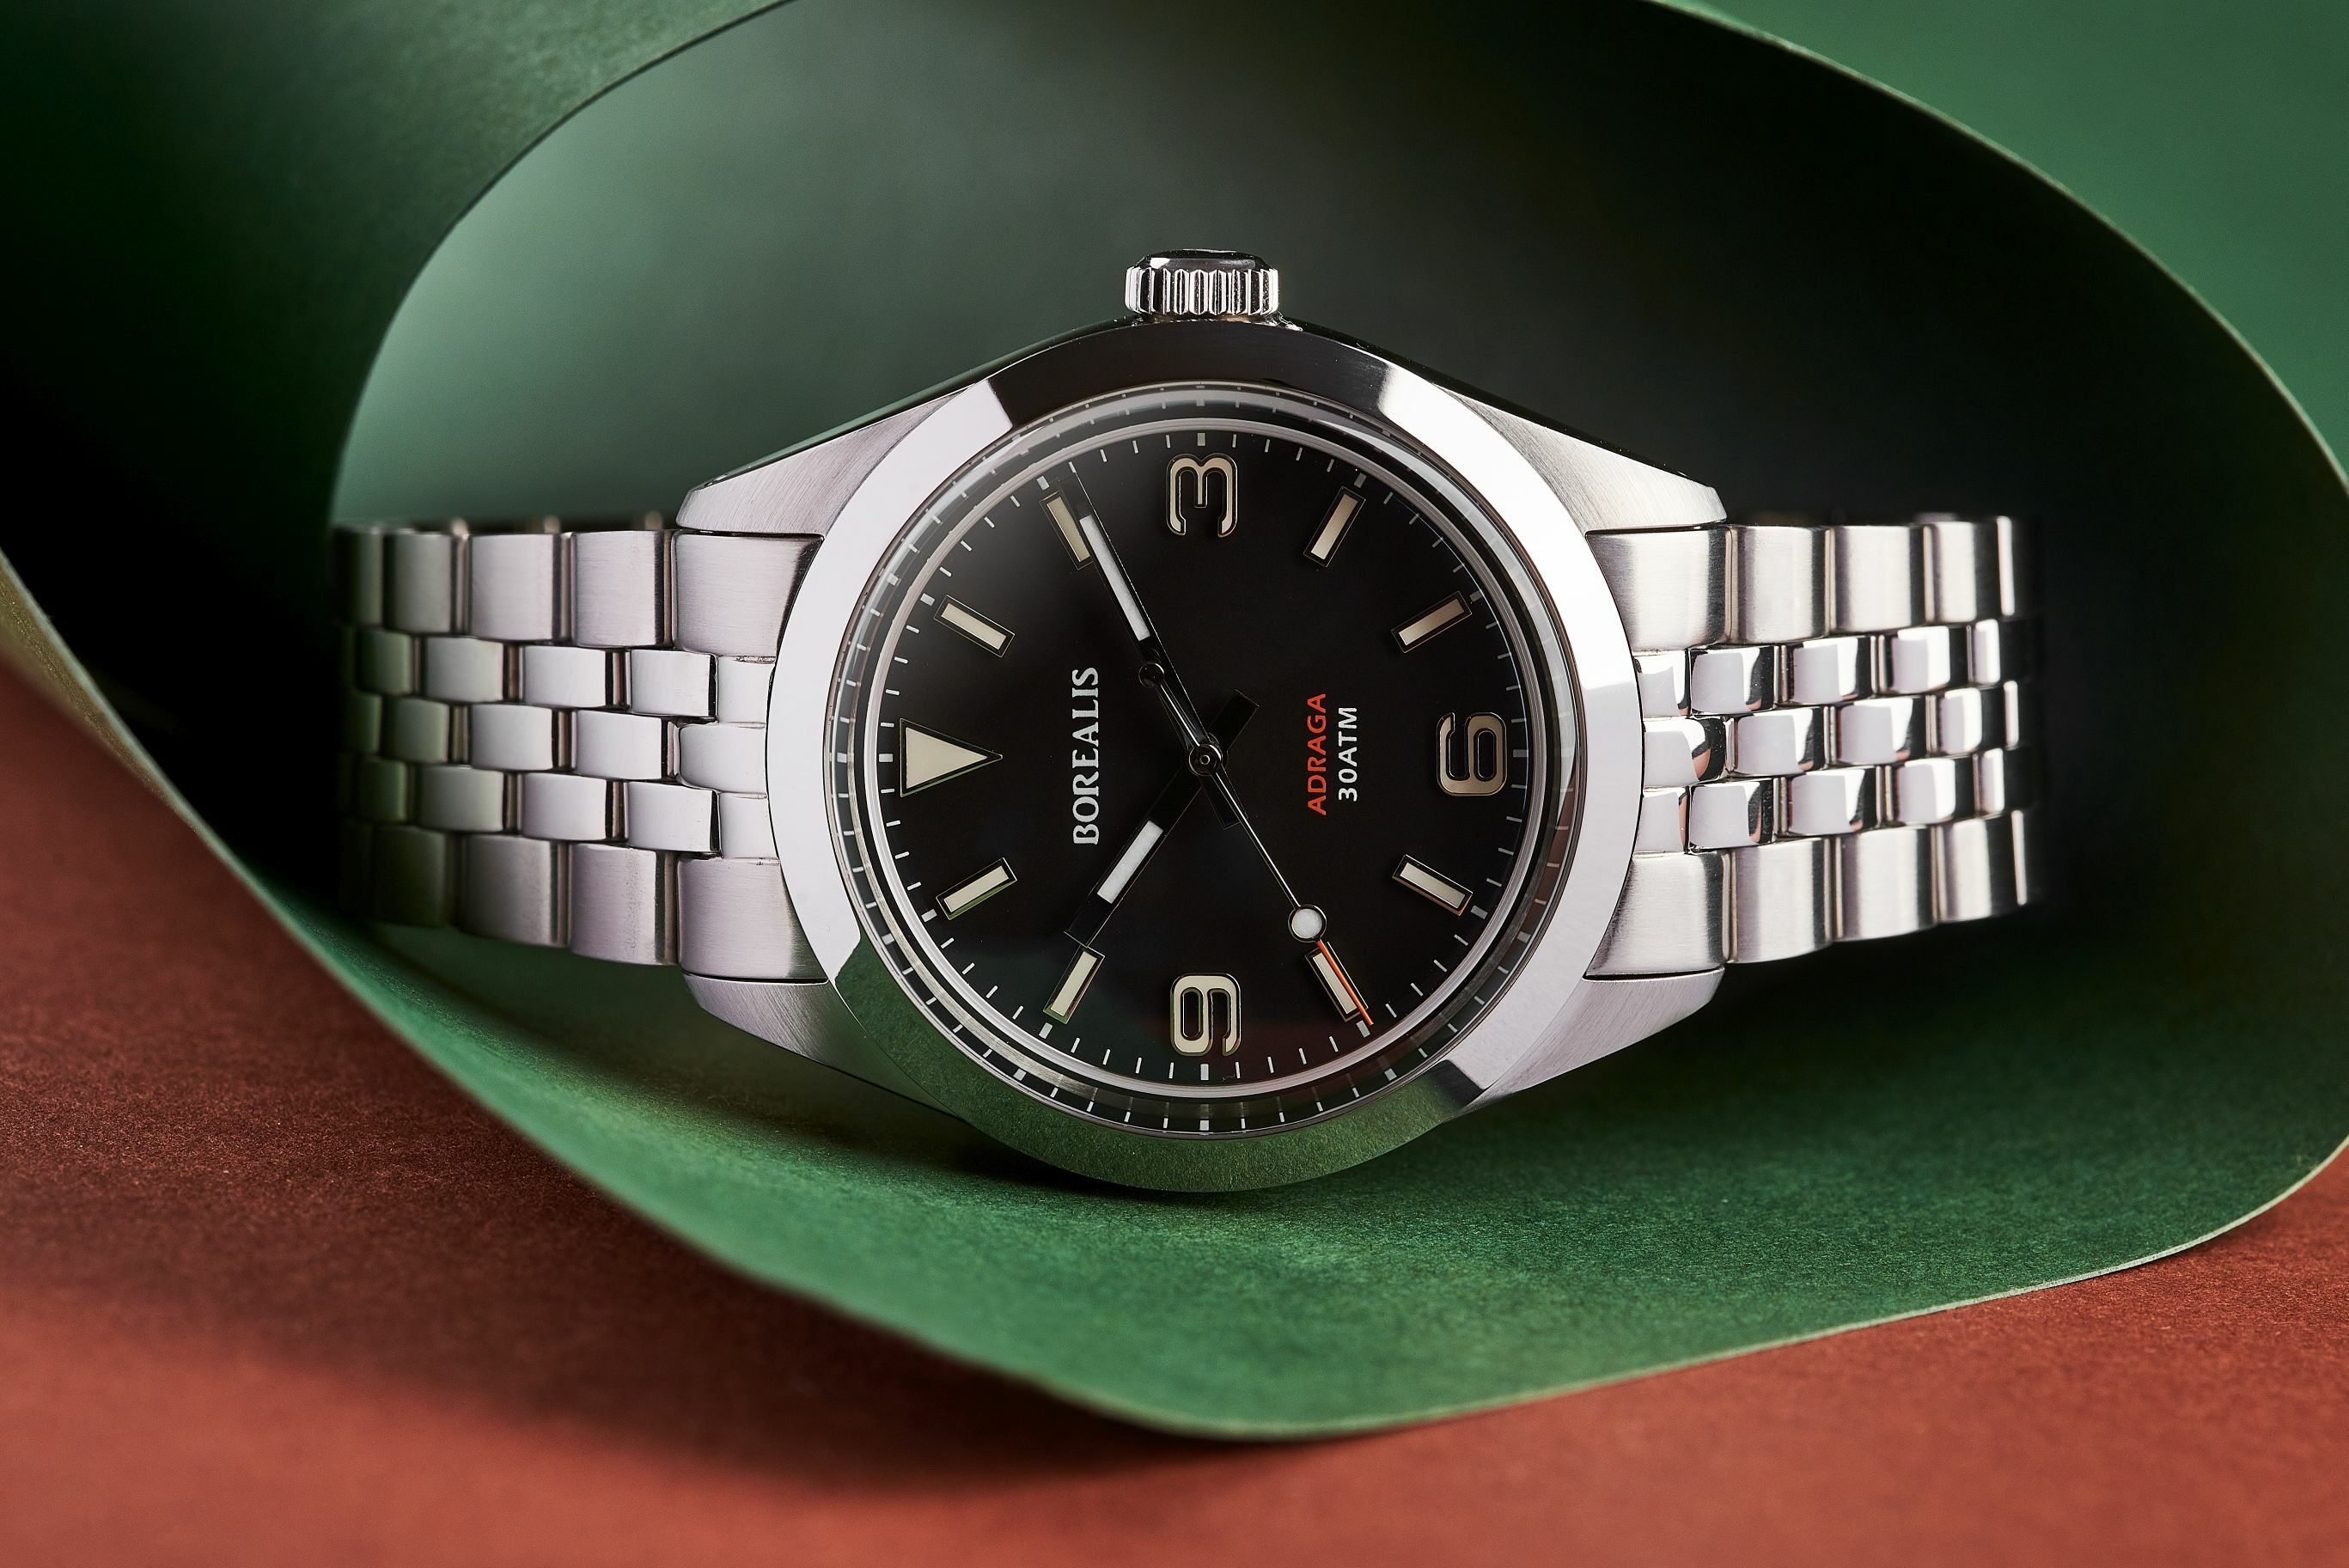 Borealis Adraga Stainless Steel Miyota 90S5 black dial Commando Hands no Date BGW9 Lume